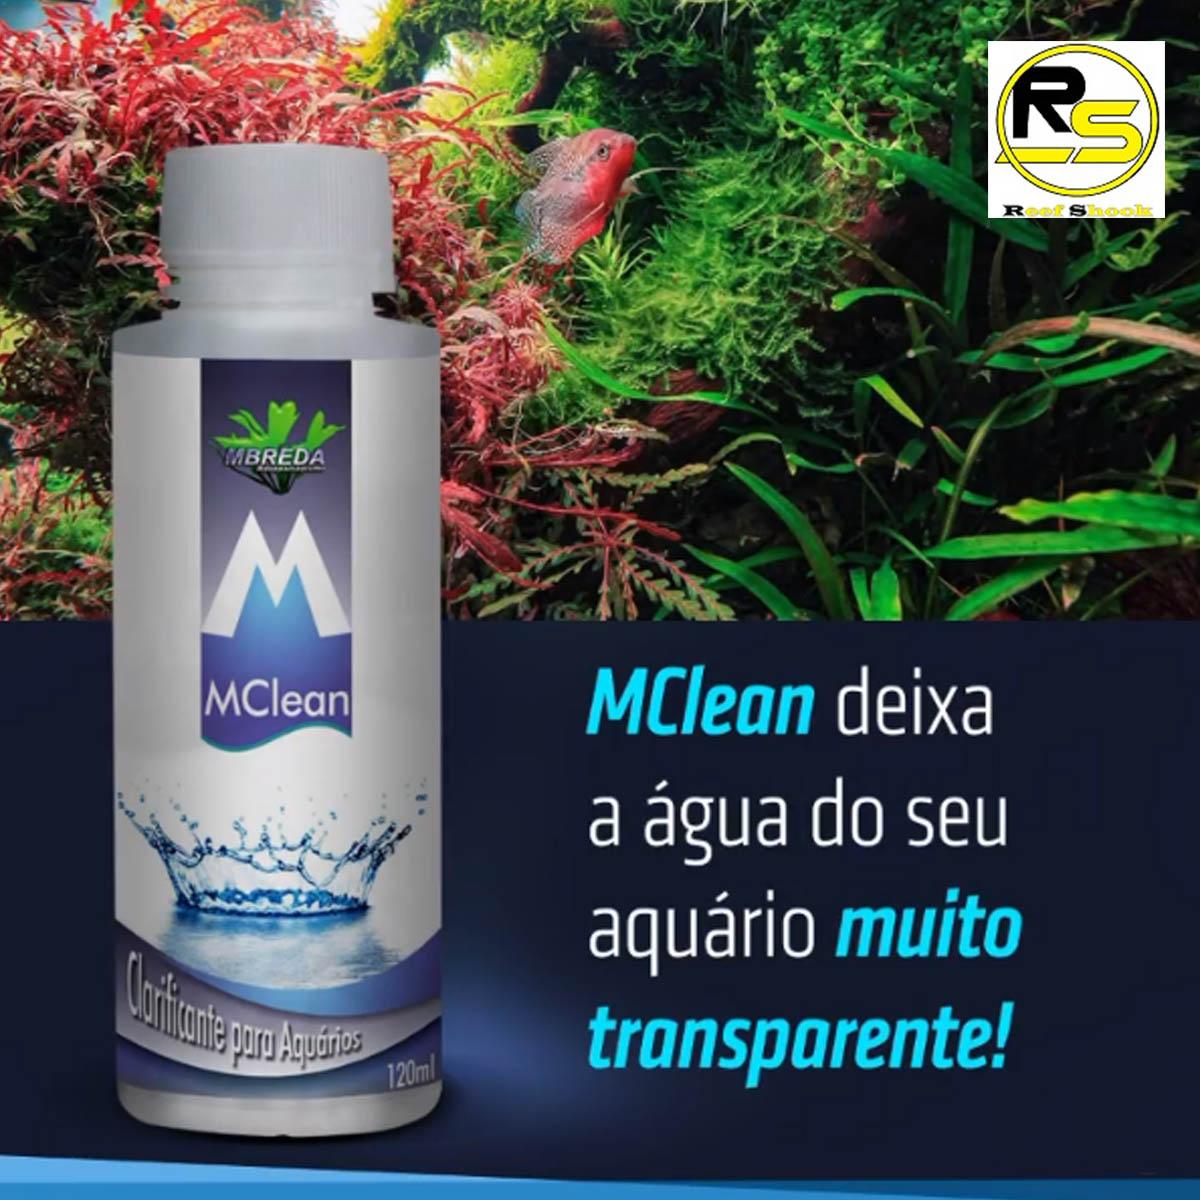 Clarificante Mclean Mbreda para Aquario 120ml